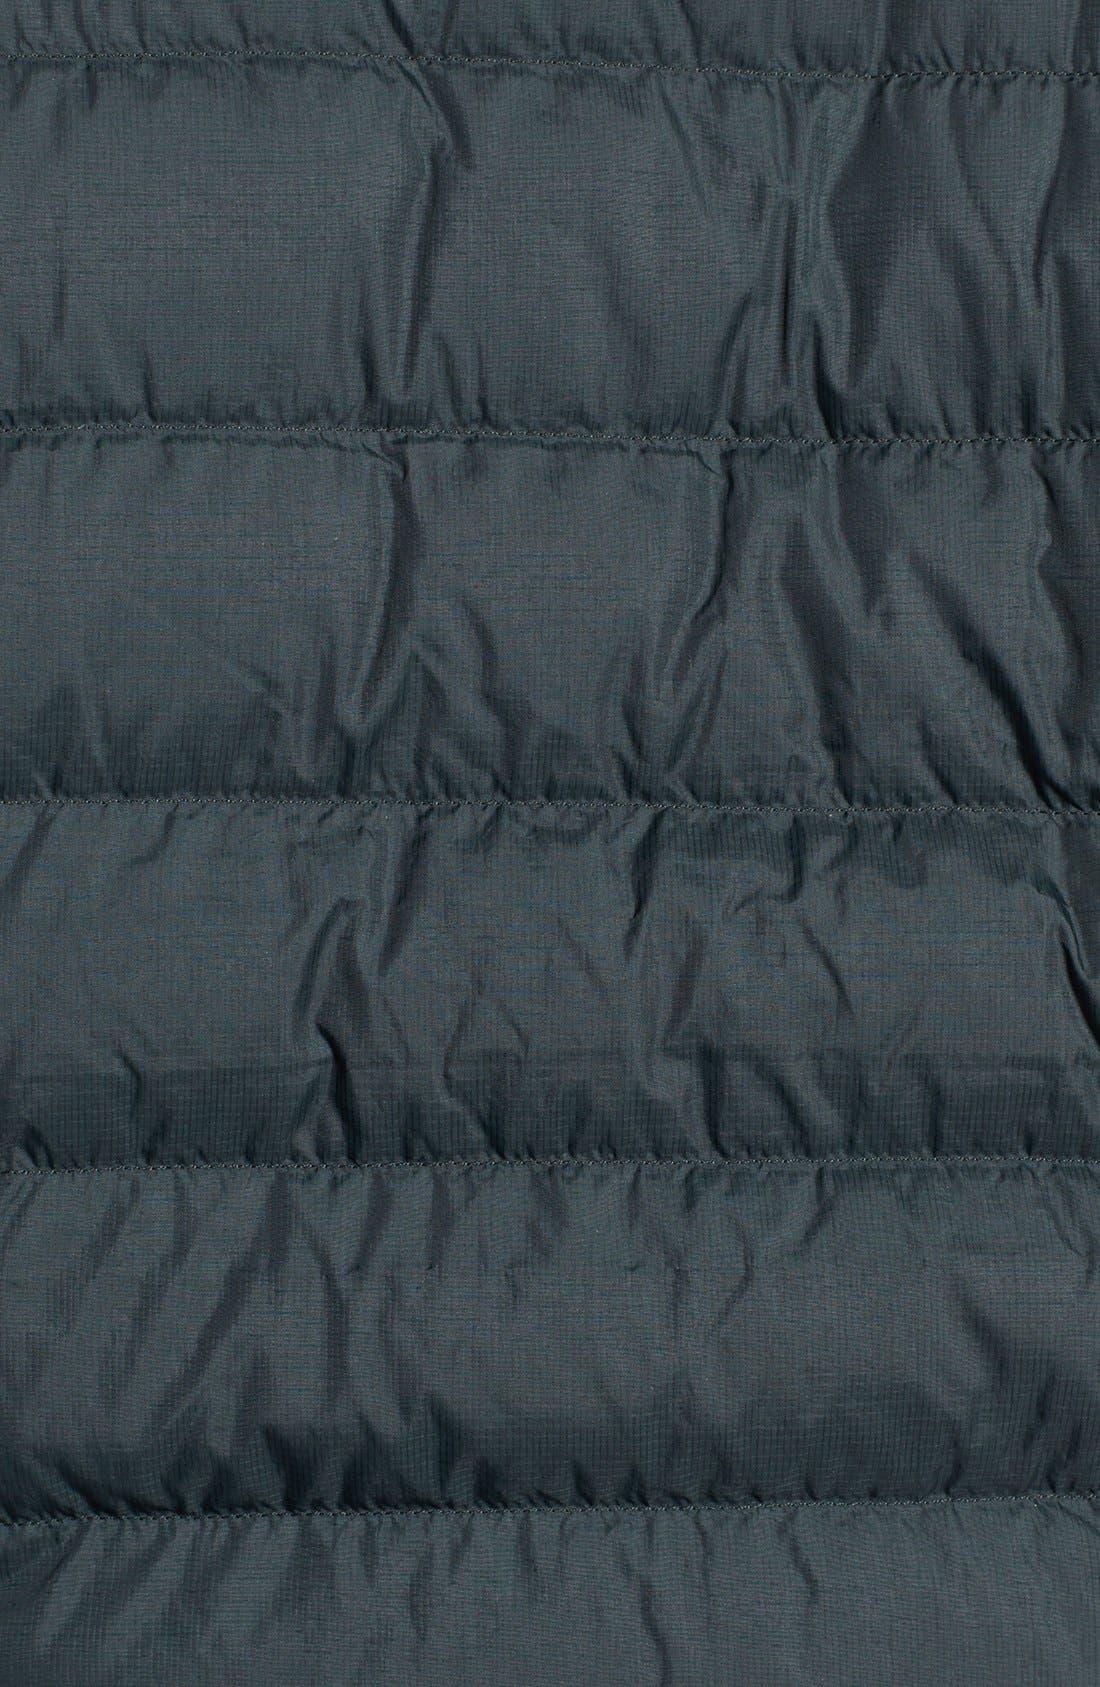 Thorium AR Water Resistant 750 Fill Power Down Jacket,                             Alternate thumbnail 5, color,                             Odysseus